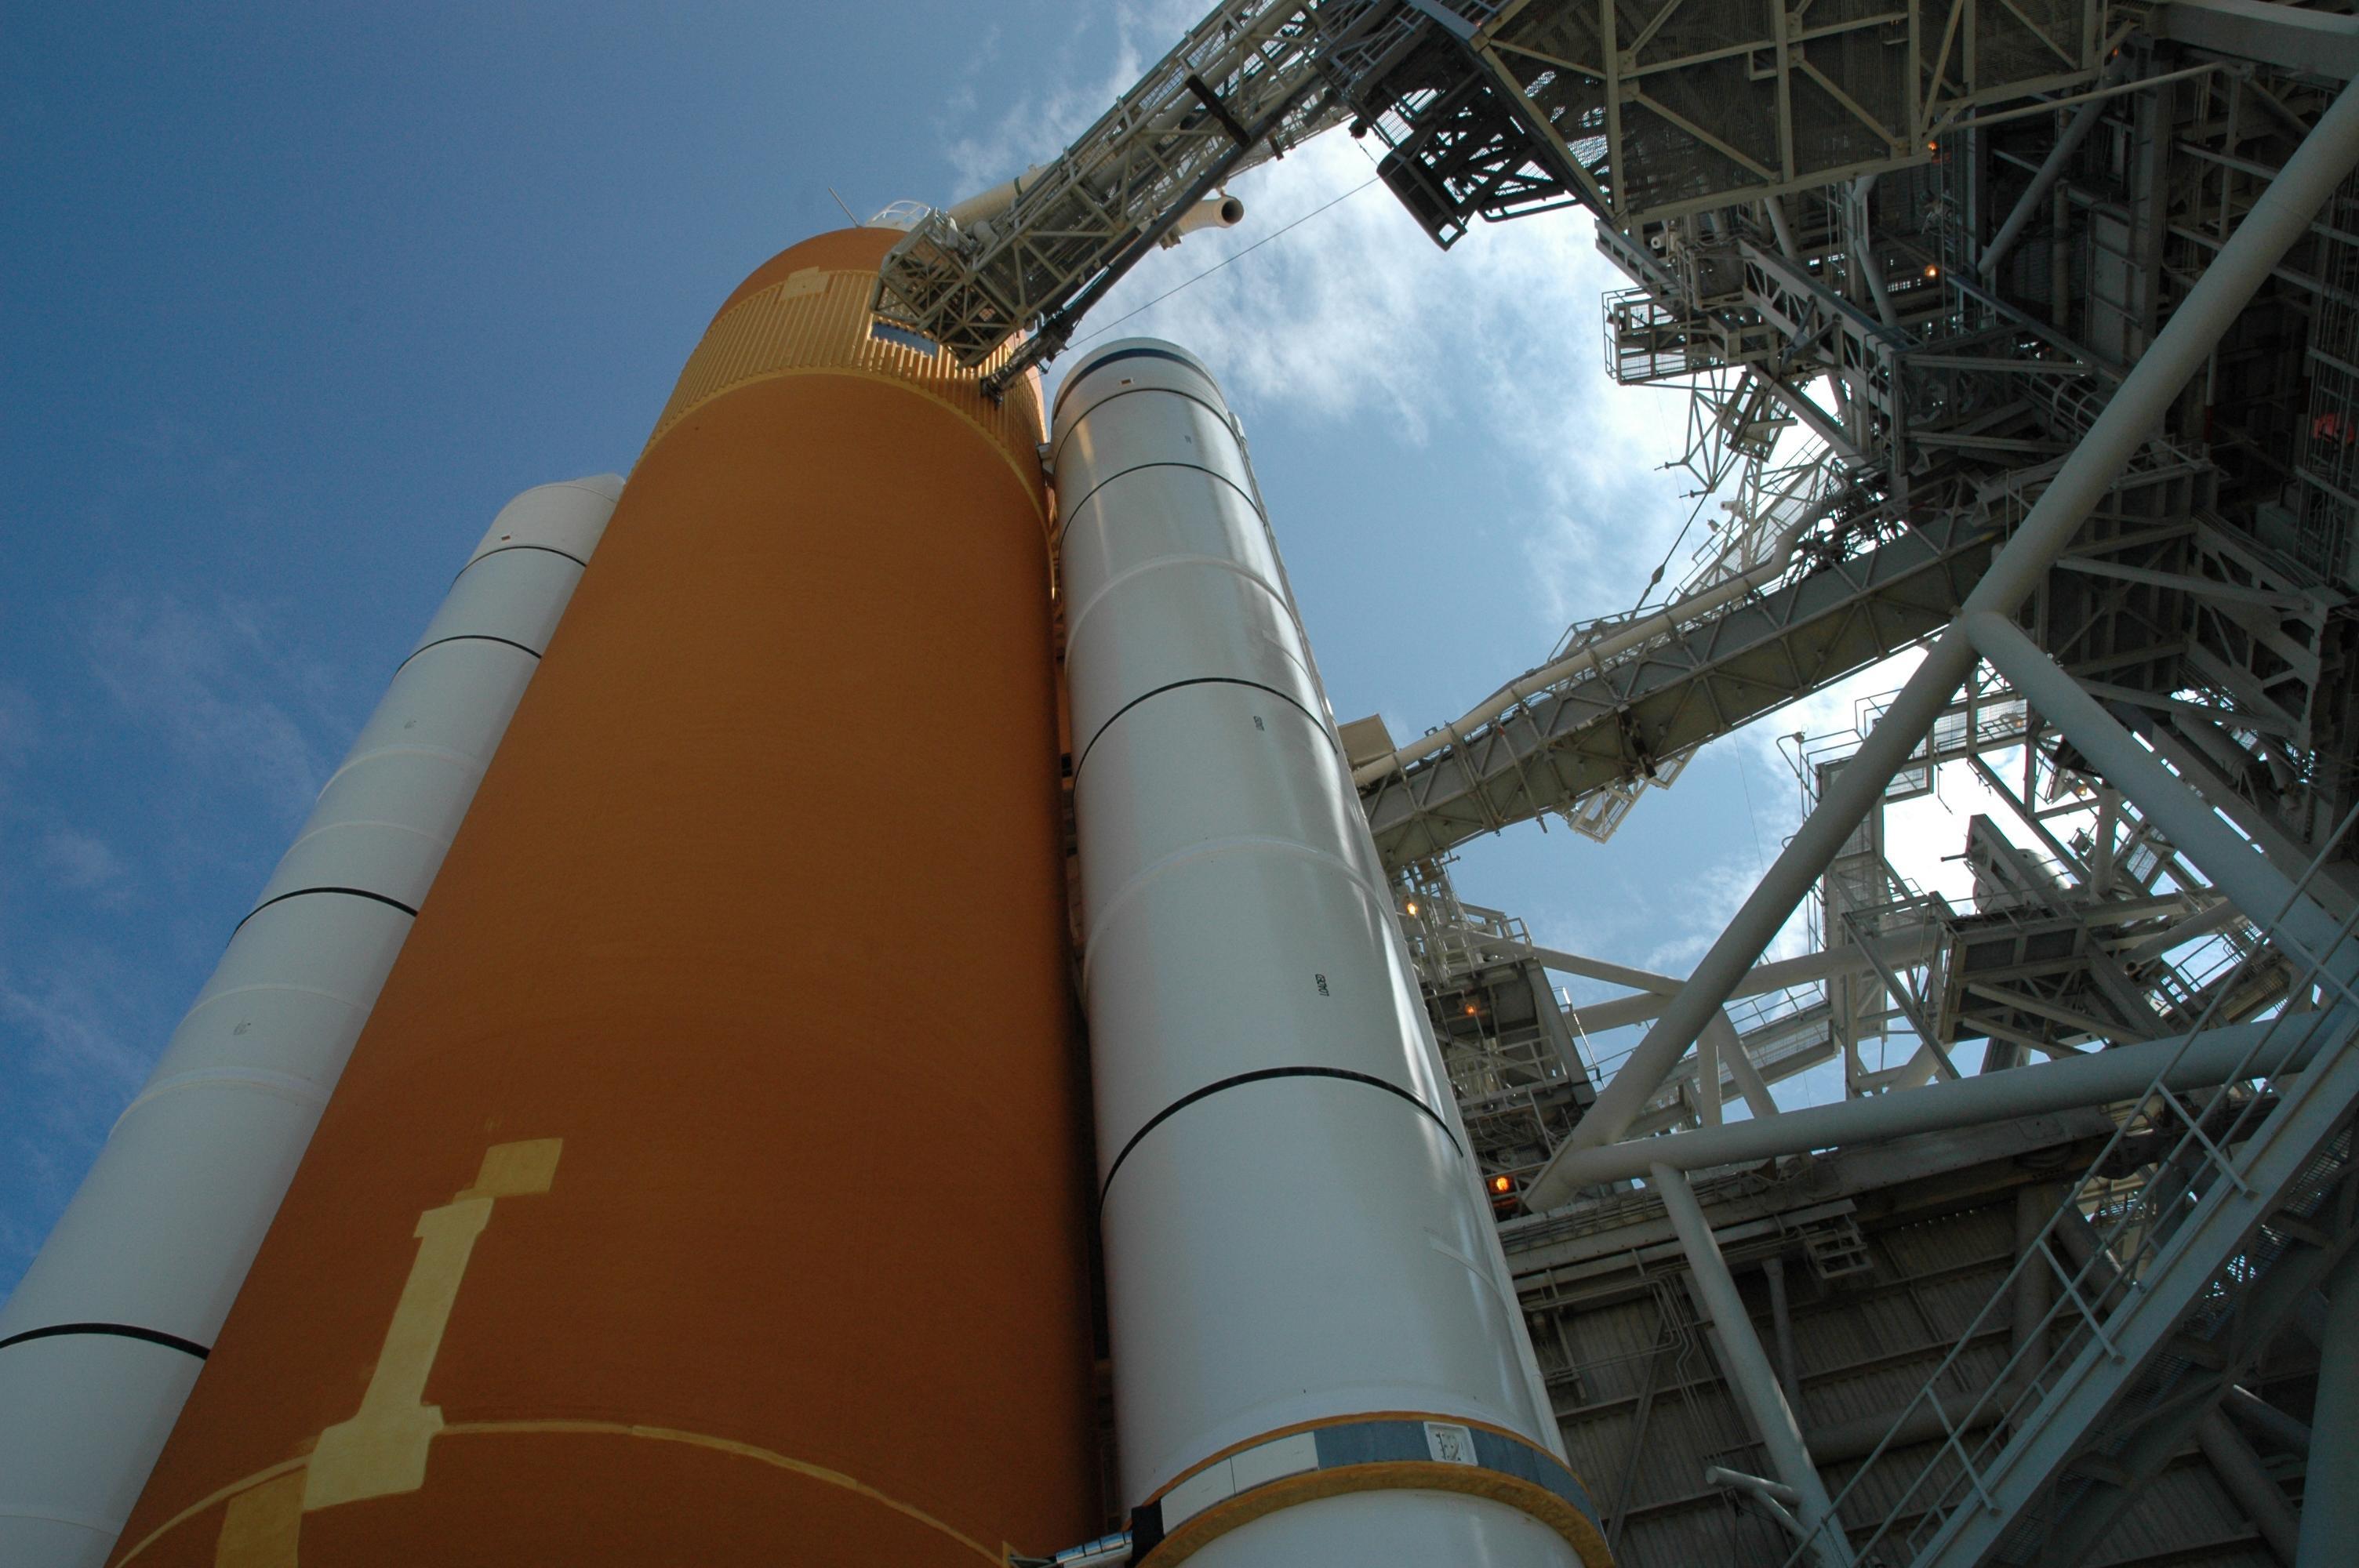 space shuttle srb - photo #1